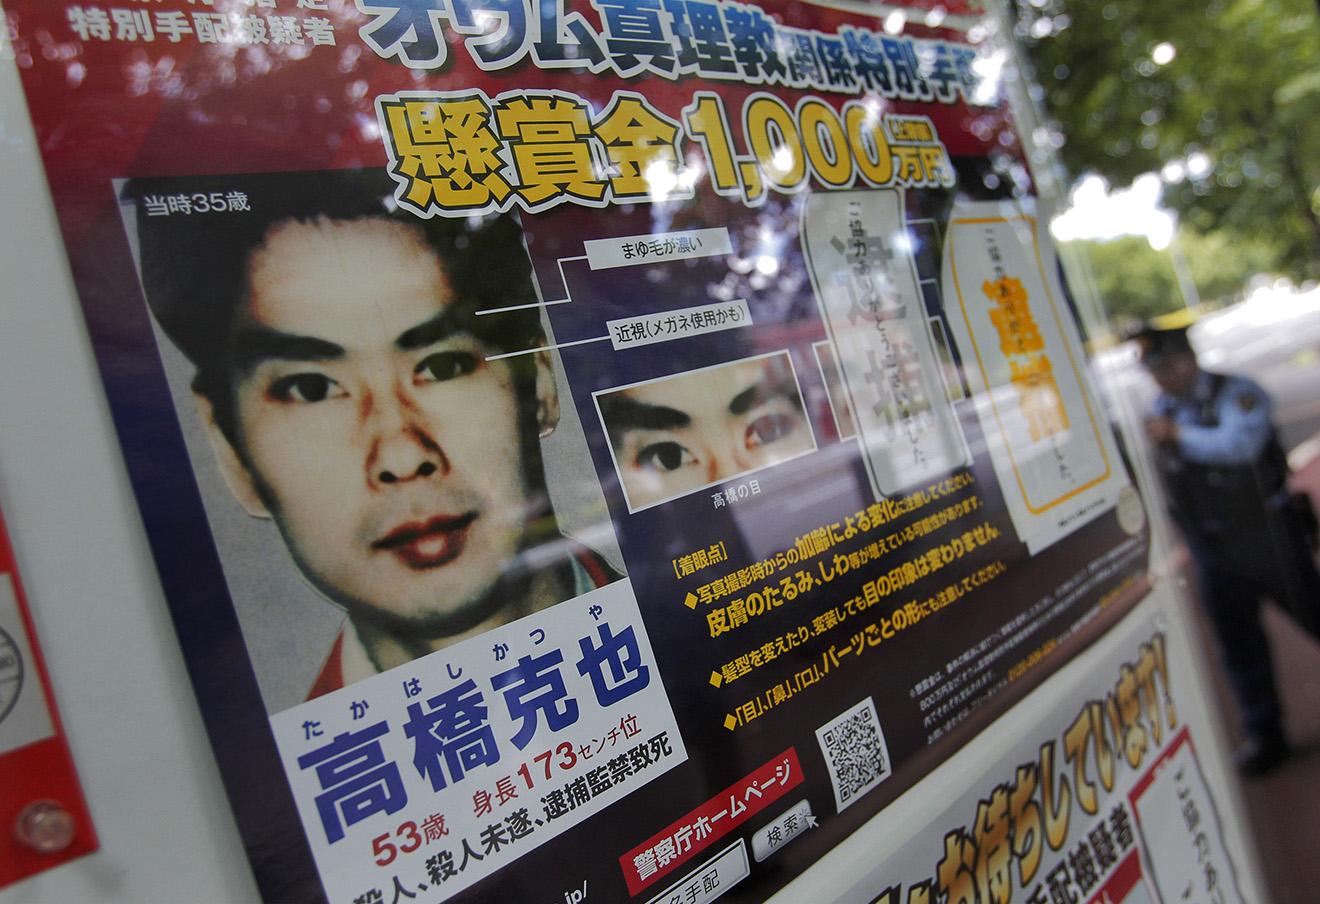 Плакат с портретом члена «Аум синрике» в Токио, 2012 год. Фото: Itsuo Inouye / AP